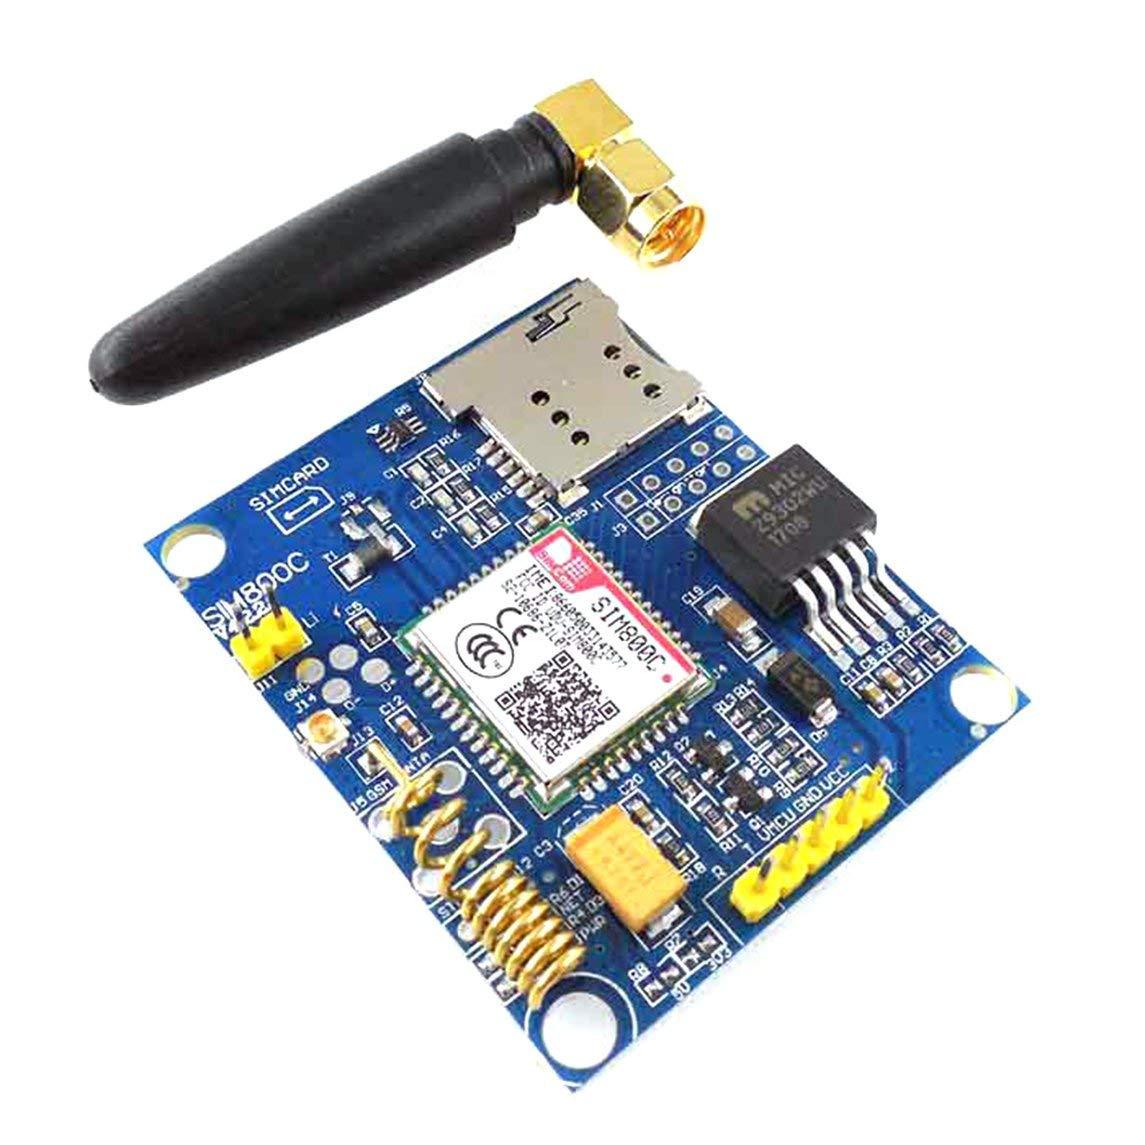 YXTFN SIM800C Development Board Quad-Band GSM GPRS Module Supports with Antenna